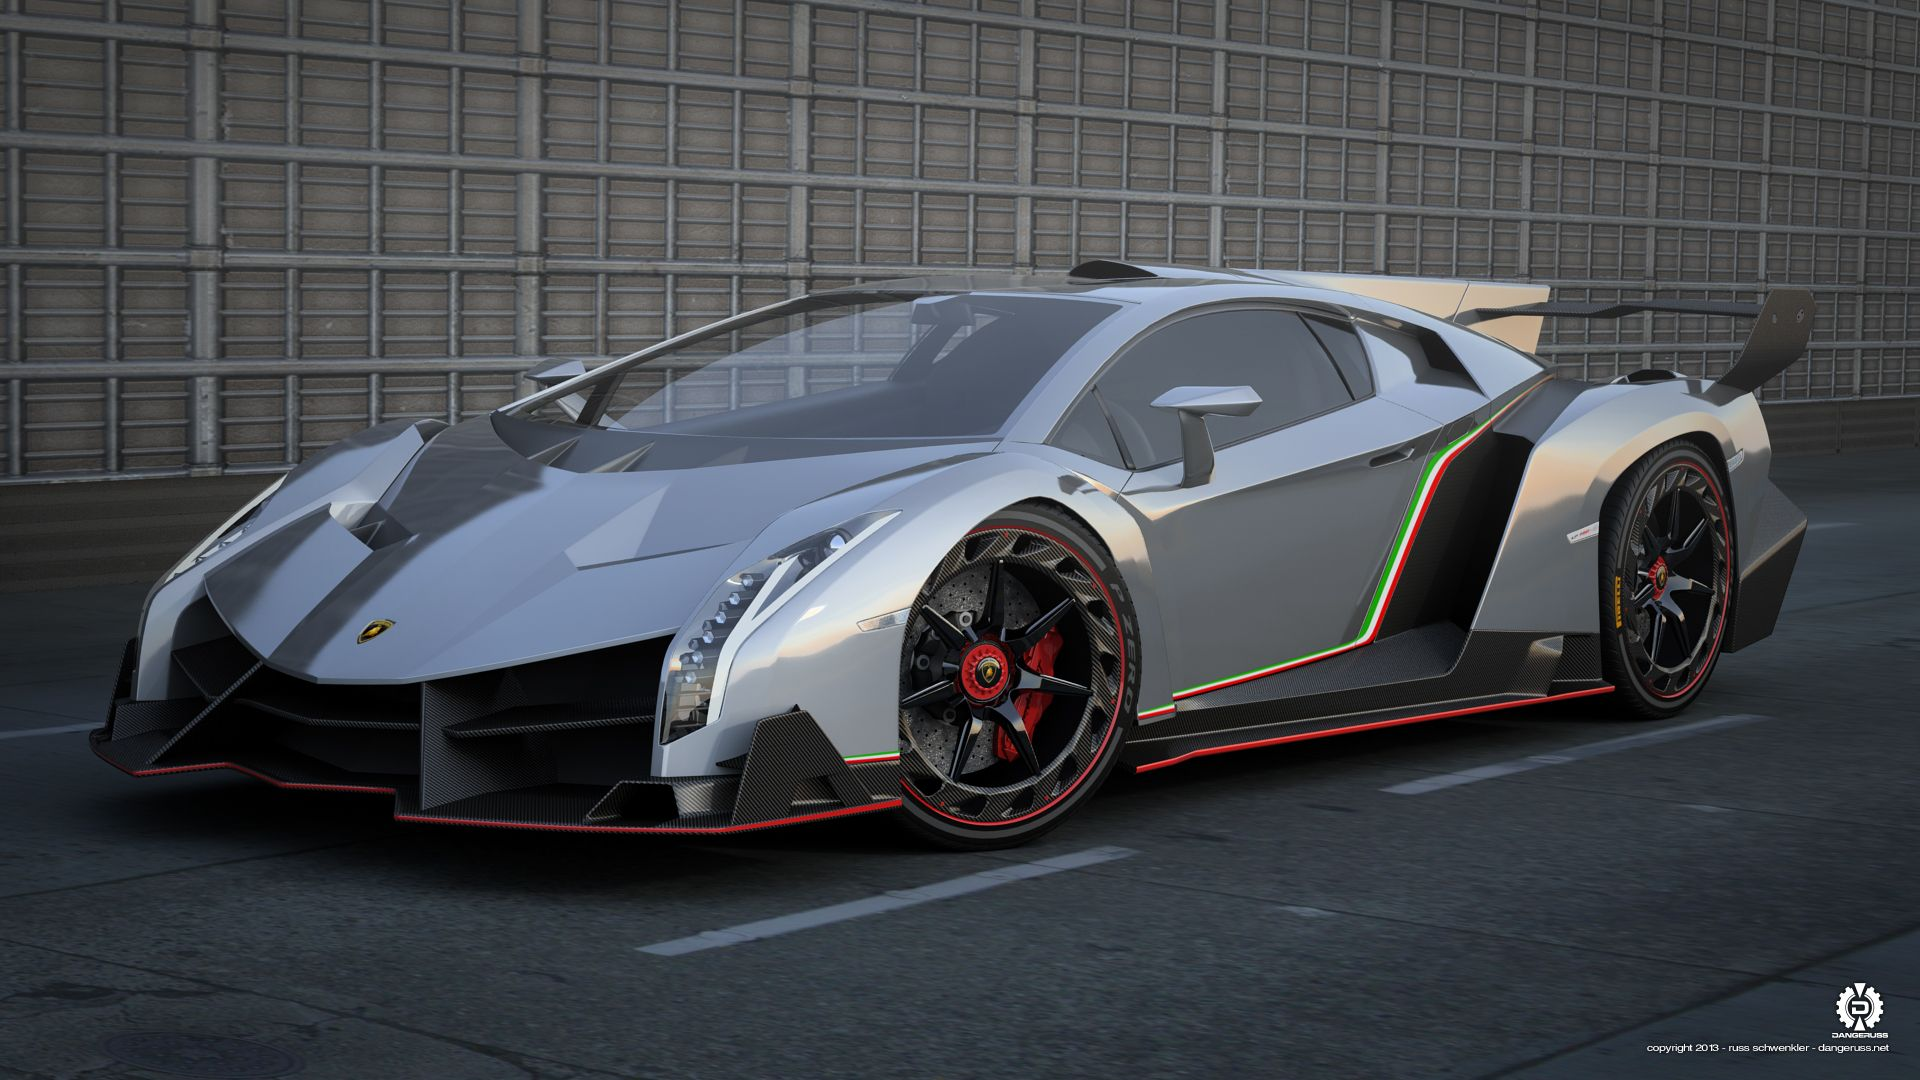 Lamborghini Veneno, Super Sports Car Wallpapers And Backgrounds, Amazing Car  Wallpapers App